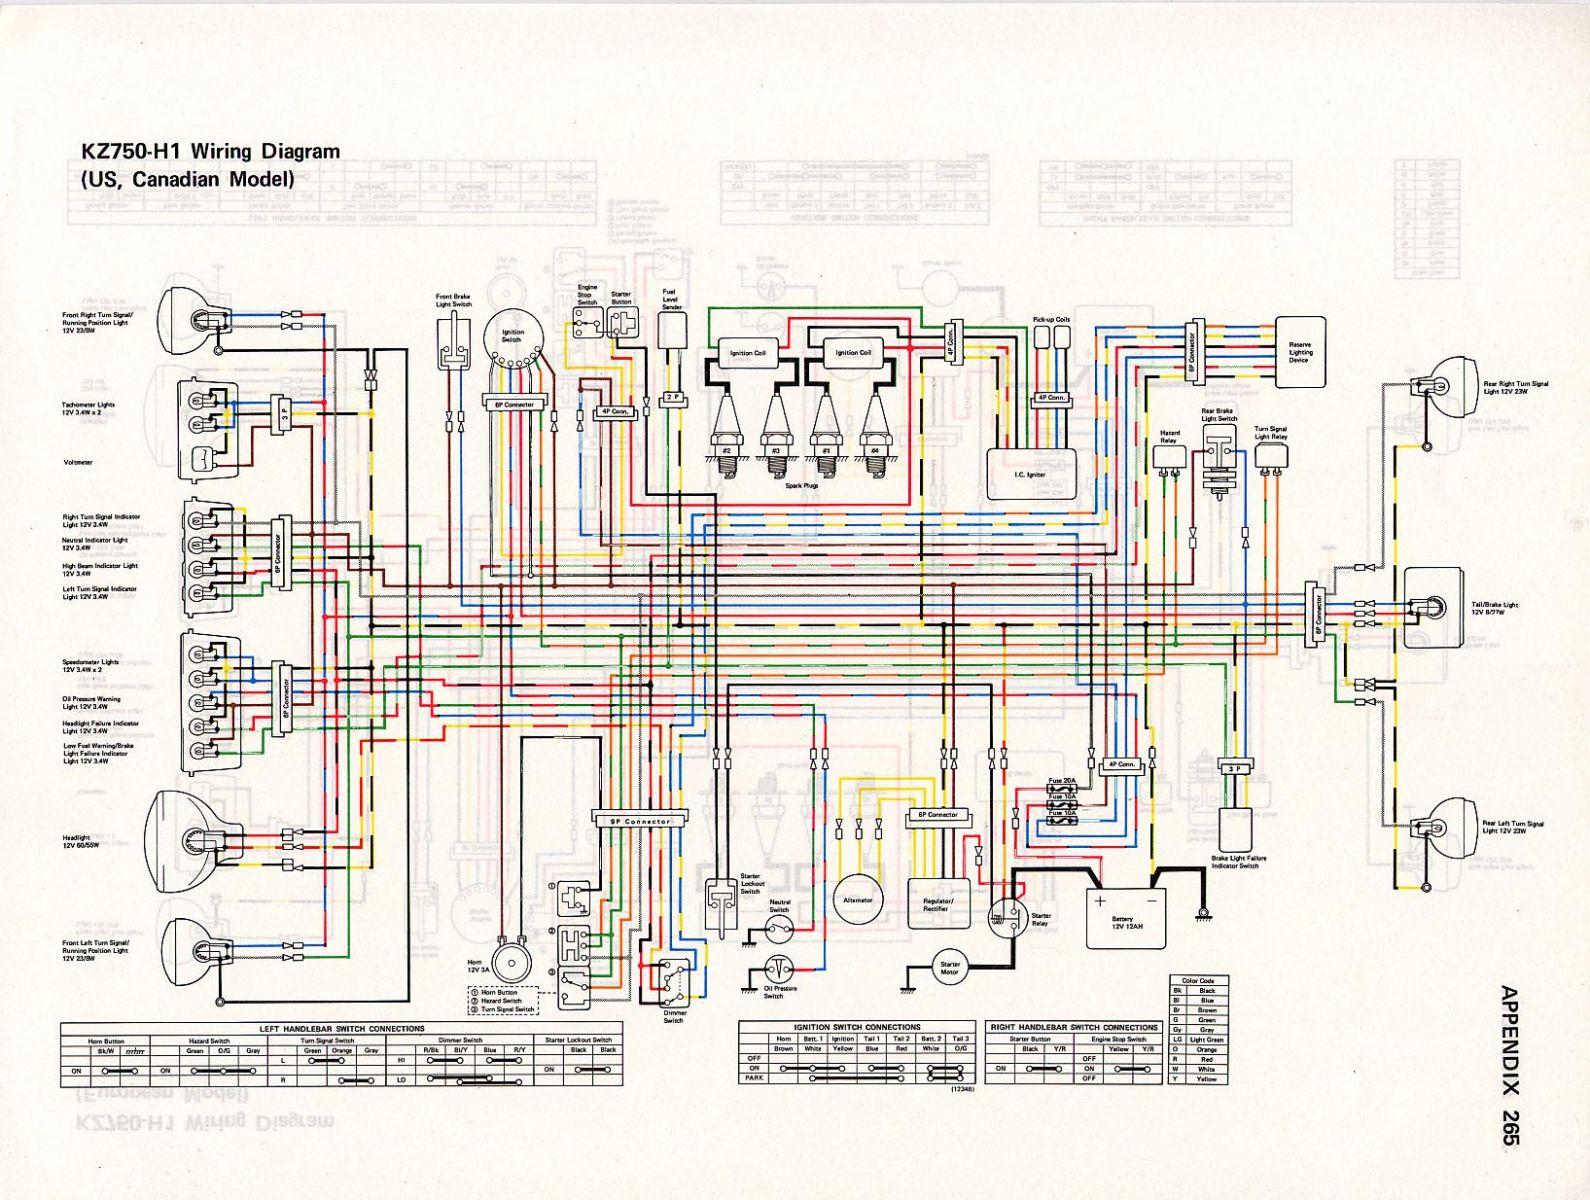 1982 kz1000 wiring diagram audio spectrum analyzer circuit 1980 kawasaki ltd yamaha dt 175